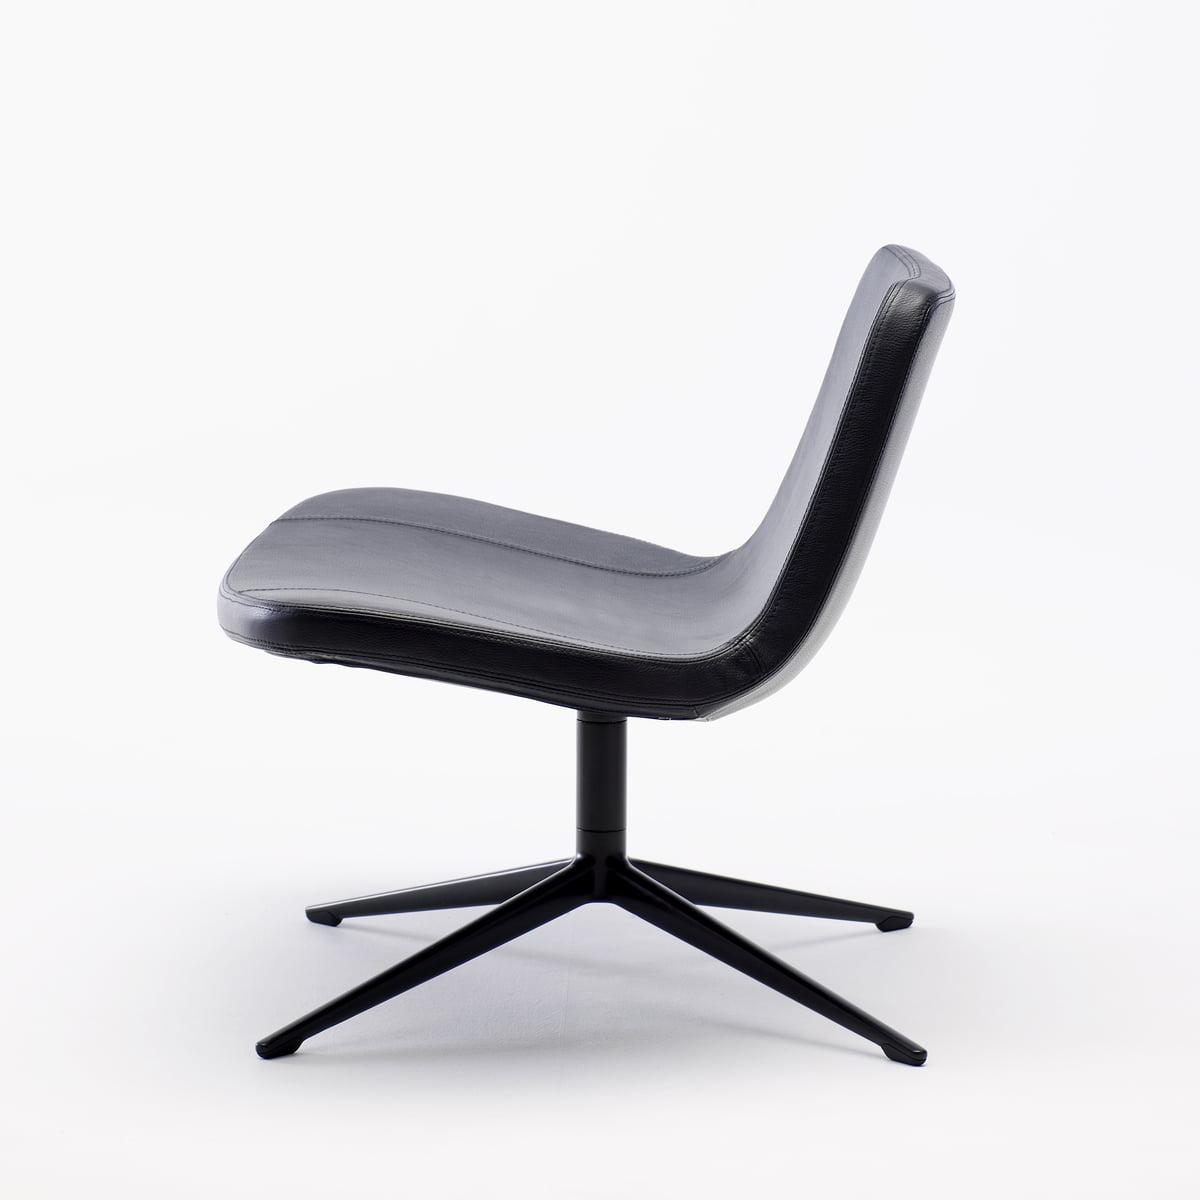 hay sofa kvadrat raymour and flanigan sectional sofas ray lounge chair, bogie | shop